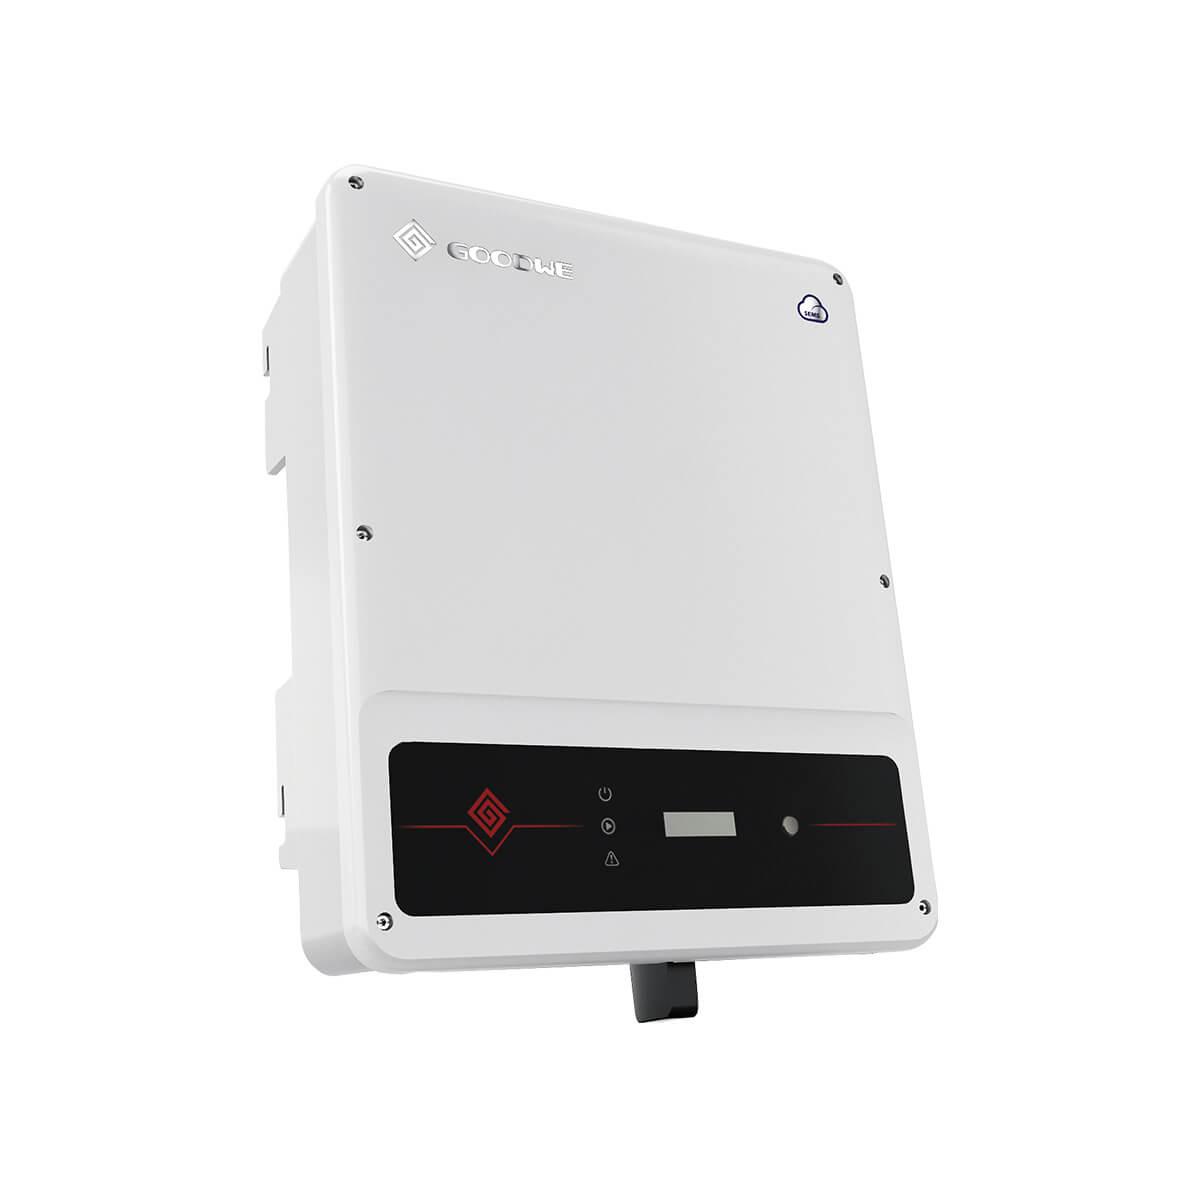 goodwe 25kW inverter, goodwe gw25kt-dt 25kW inverter, goodwe gw25kt-dt inverter, goodwe gw25kt-dt, goodwe 25 kW, GOODWE 25 KW